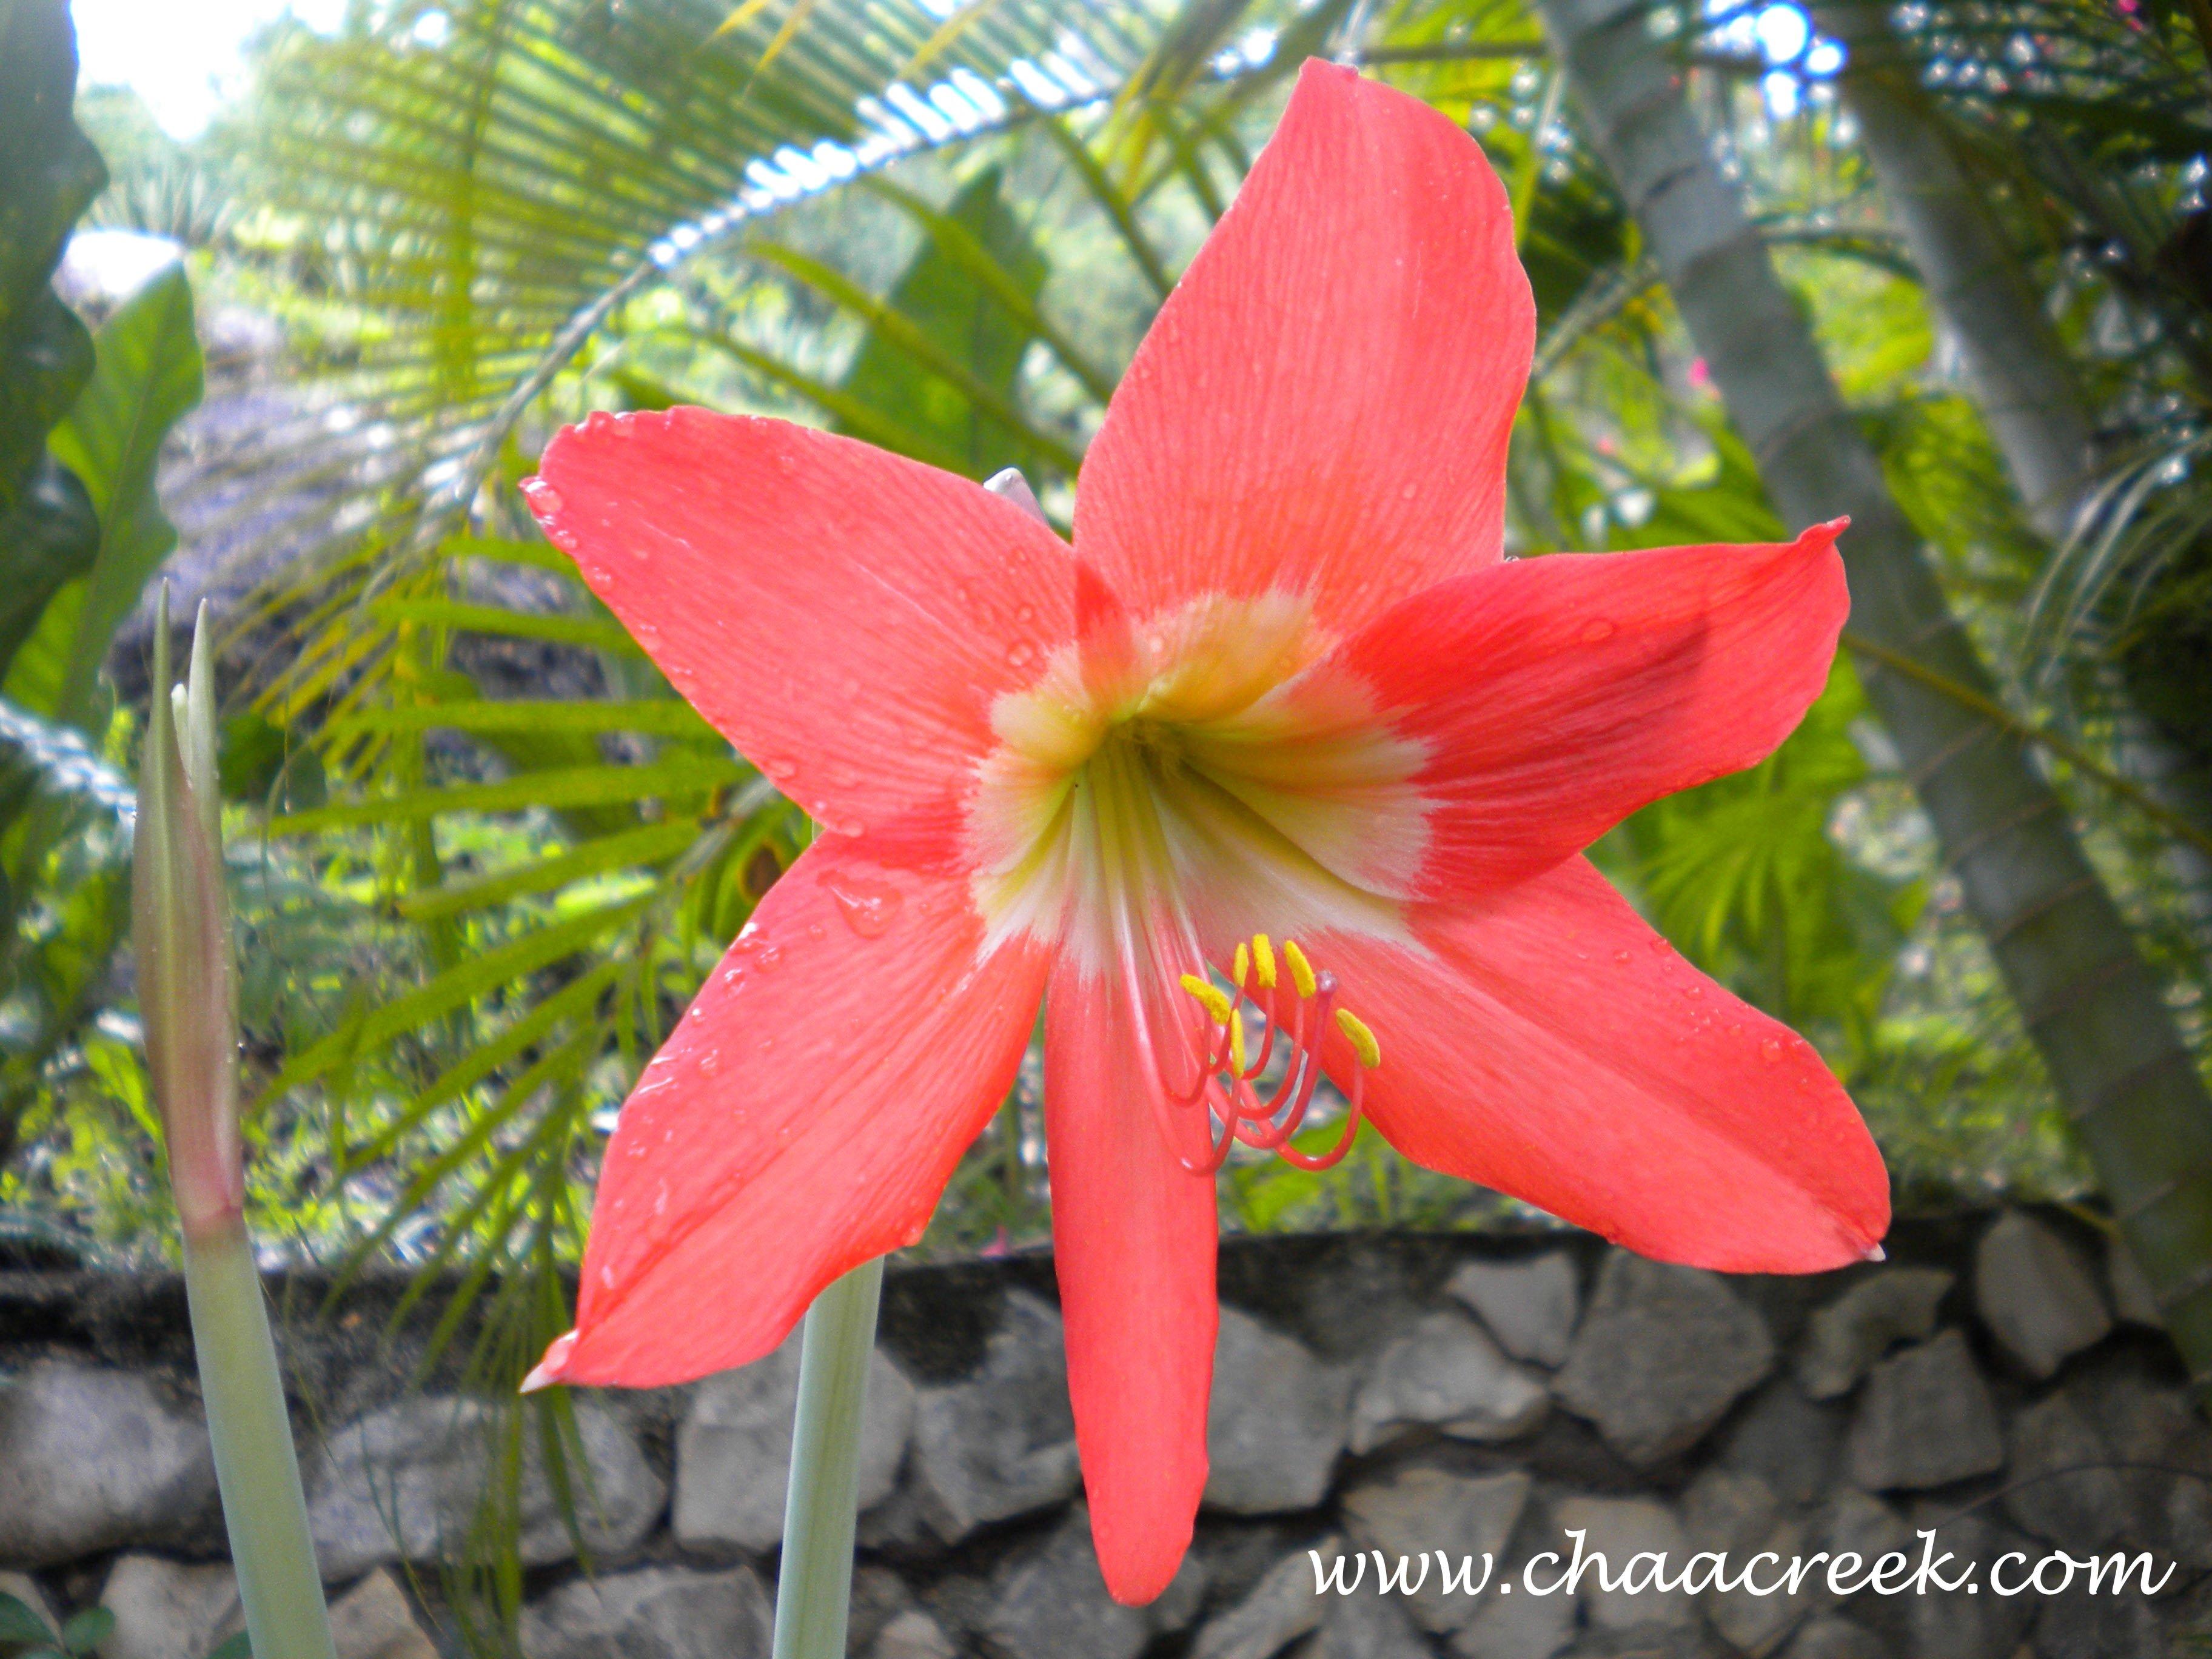 Amaryllis,Barbados lily